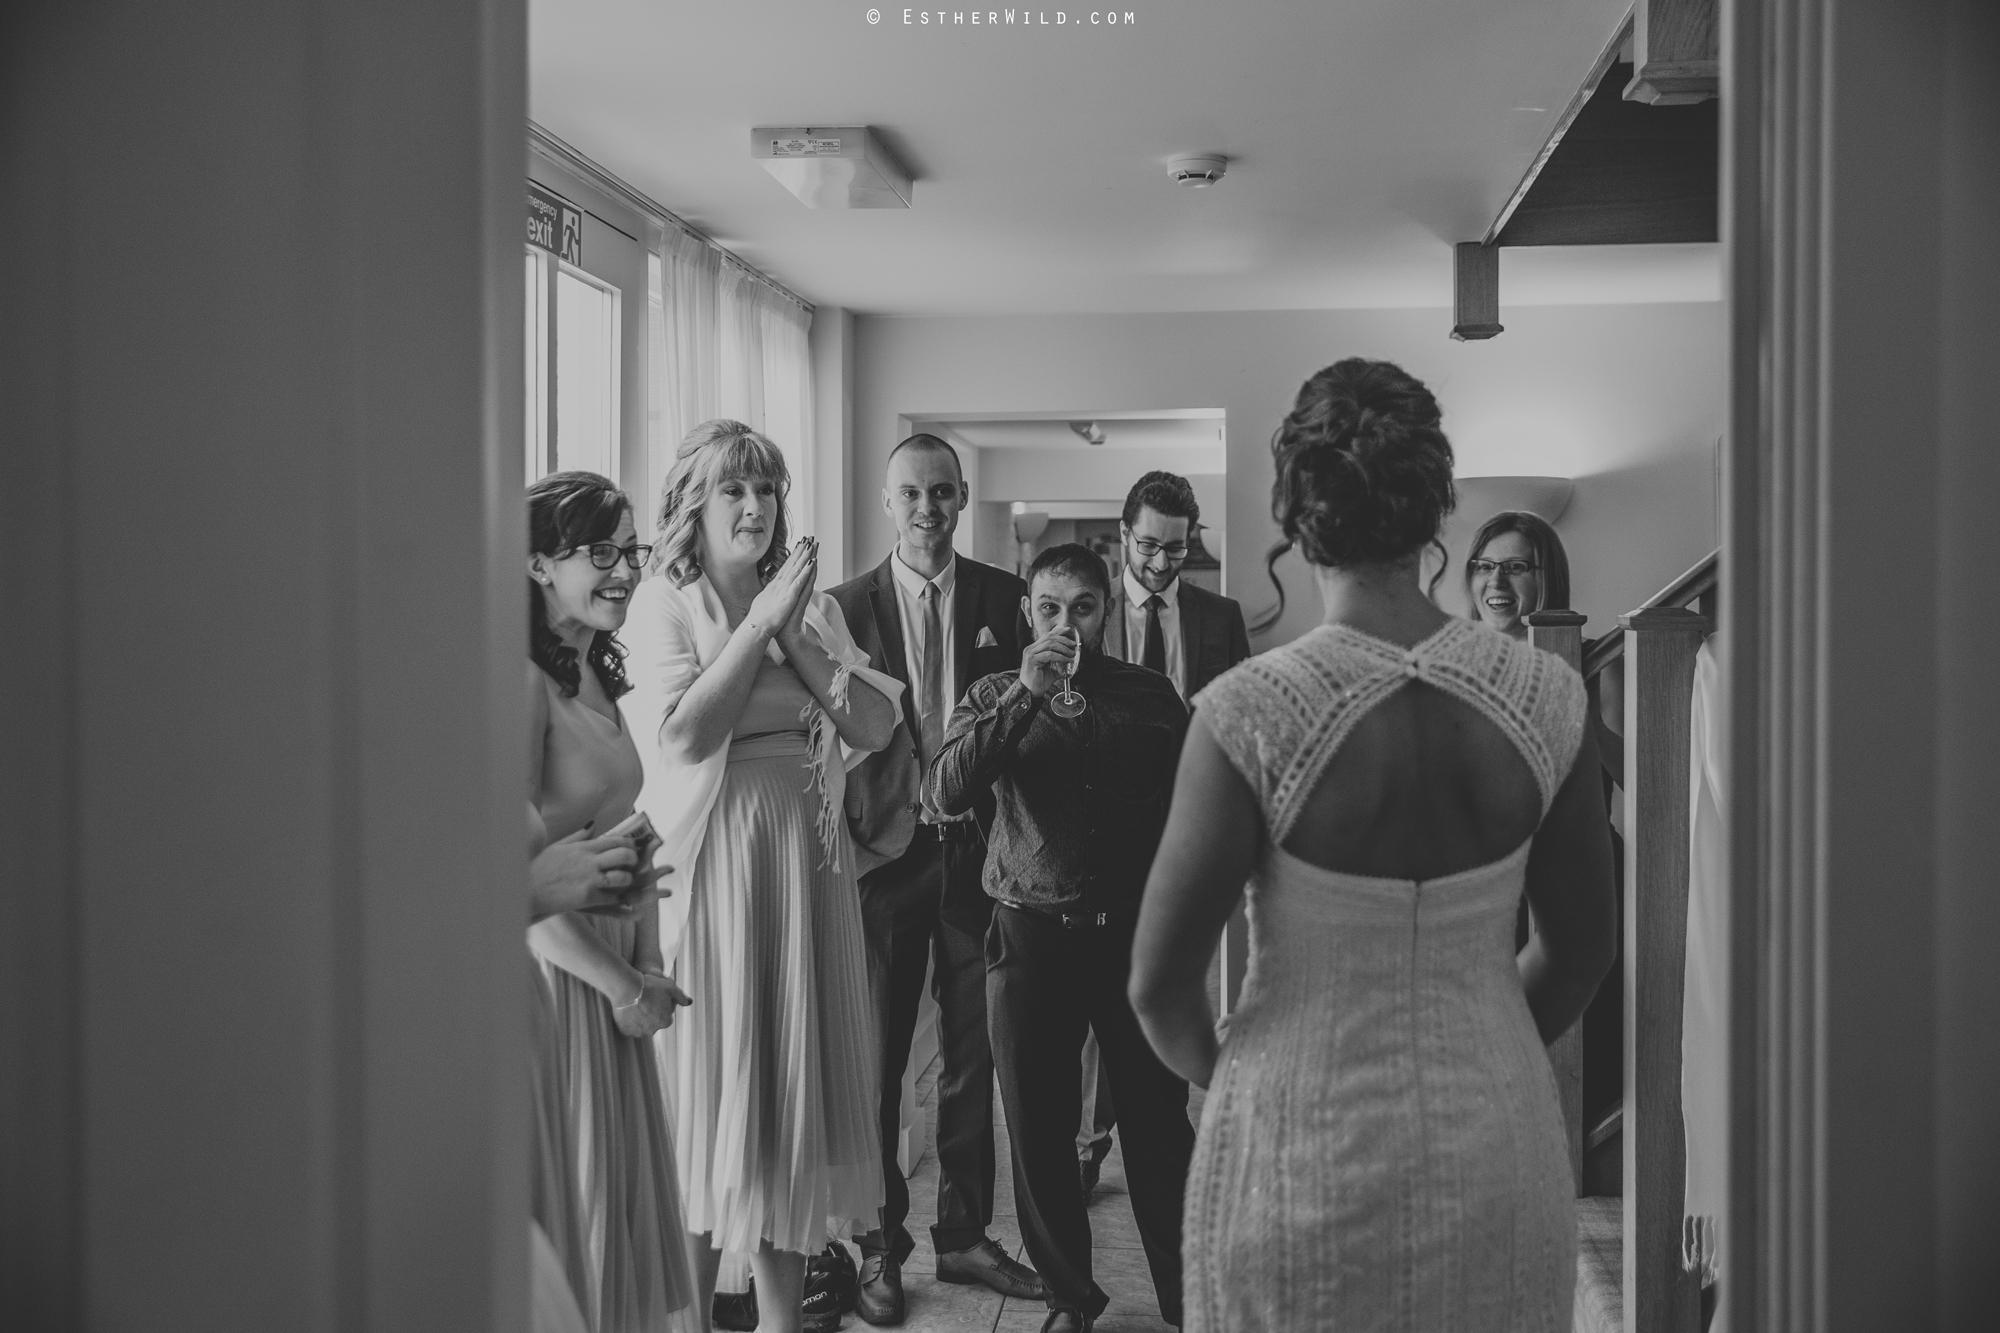 Elms_Barn_Weddings_Suffolk_Photographer_Copyright_Esther_Wild_IMG_0741-2.jpg